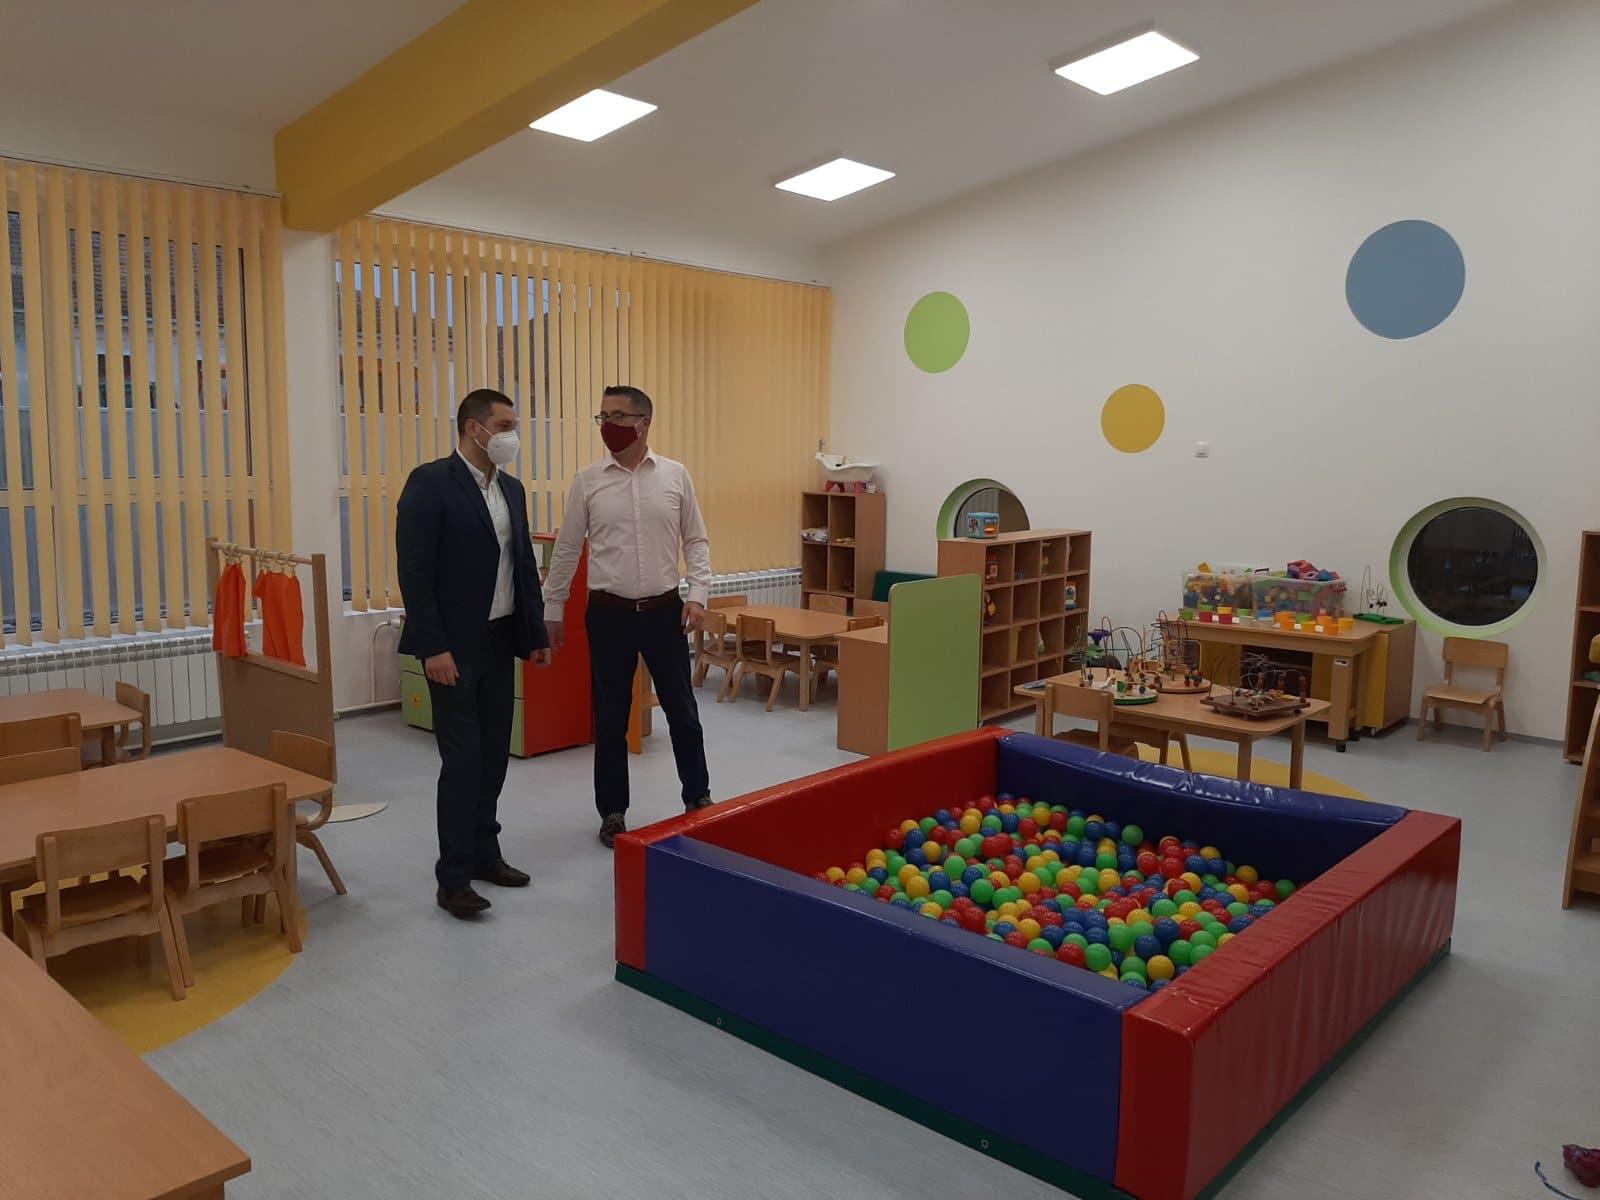 Predsednik Marković i direktor Miletić, foto: PU ,,Poletarac''